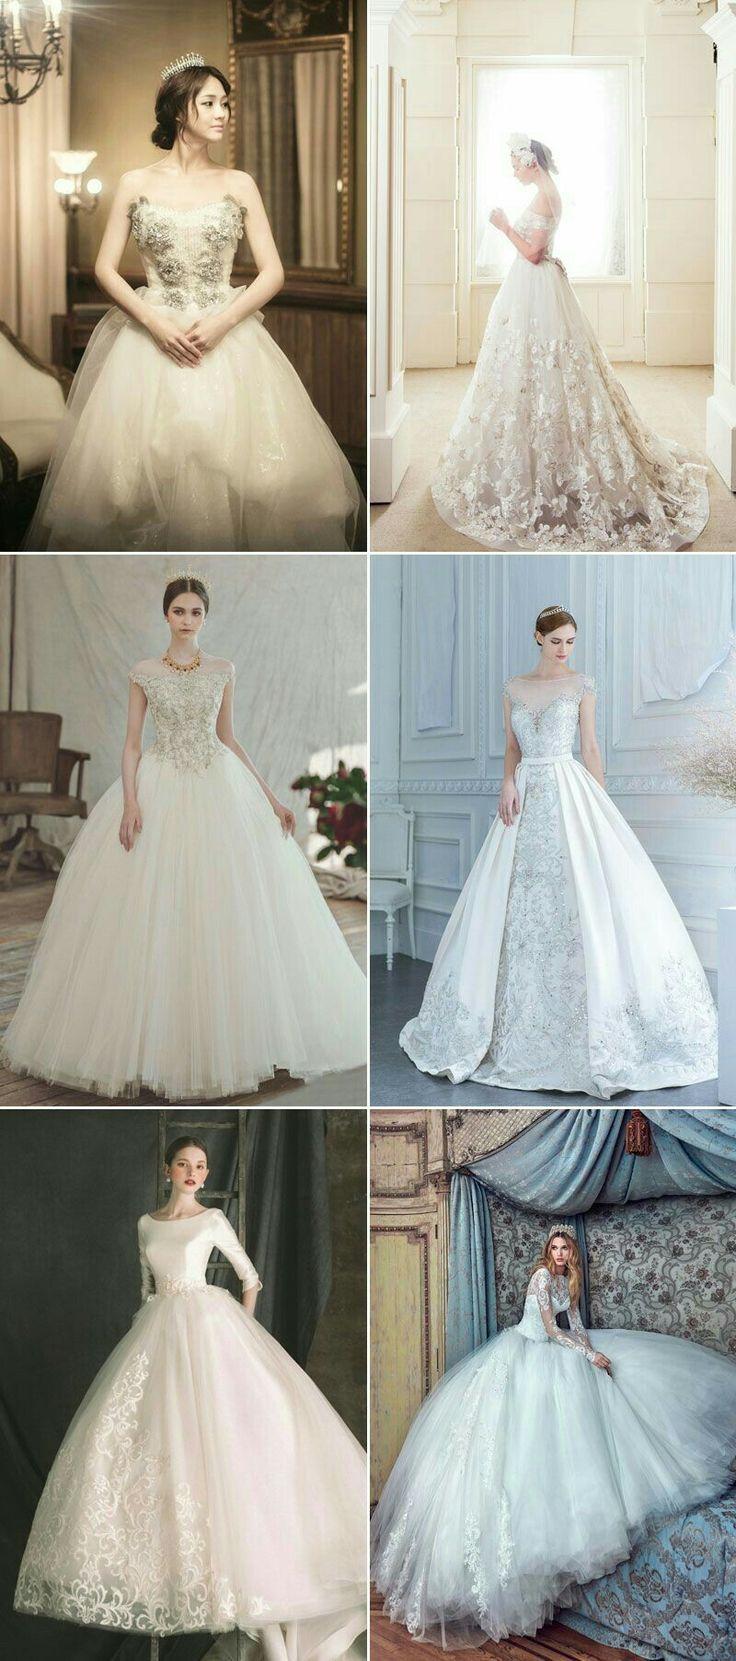 Excellent Vestidos Novia Manuel Mota Images - Wedding Ideas ...